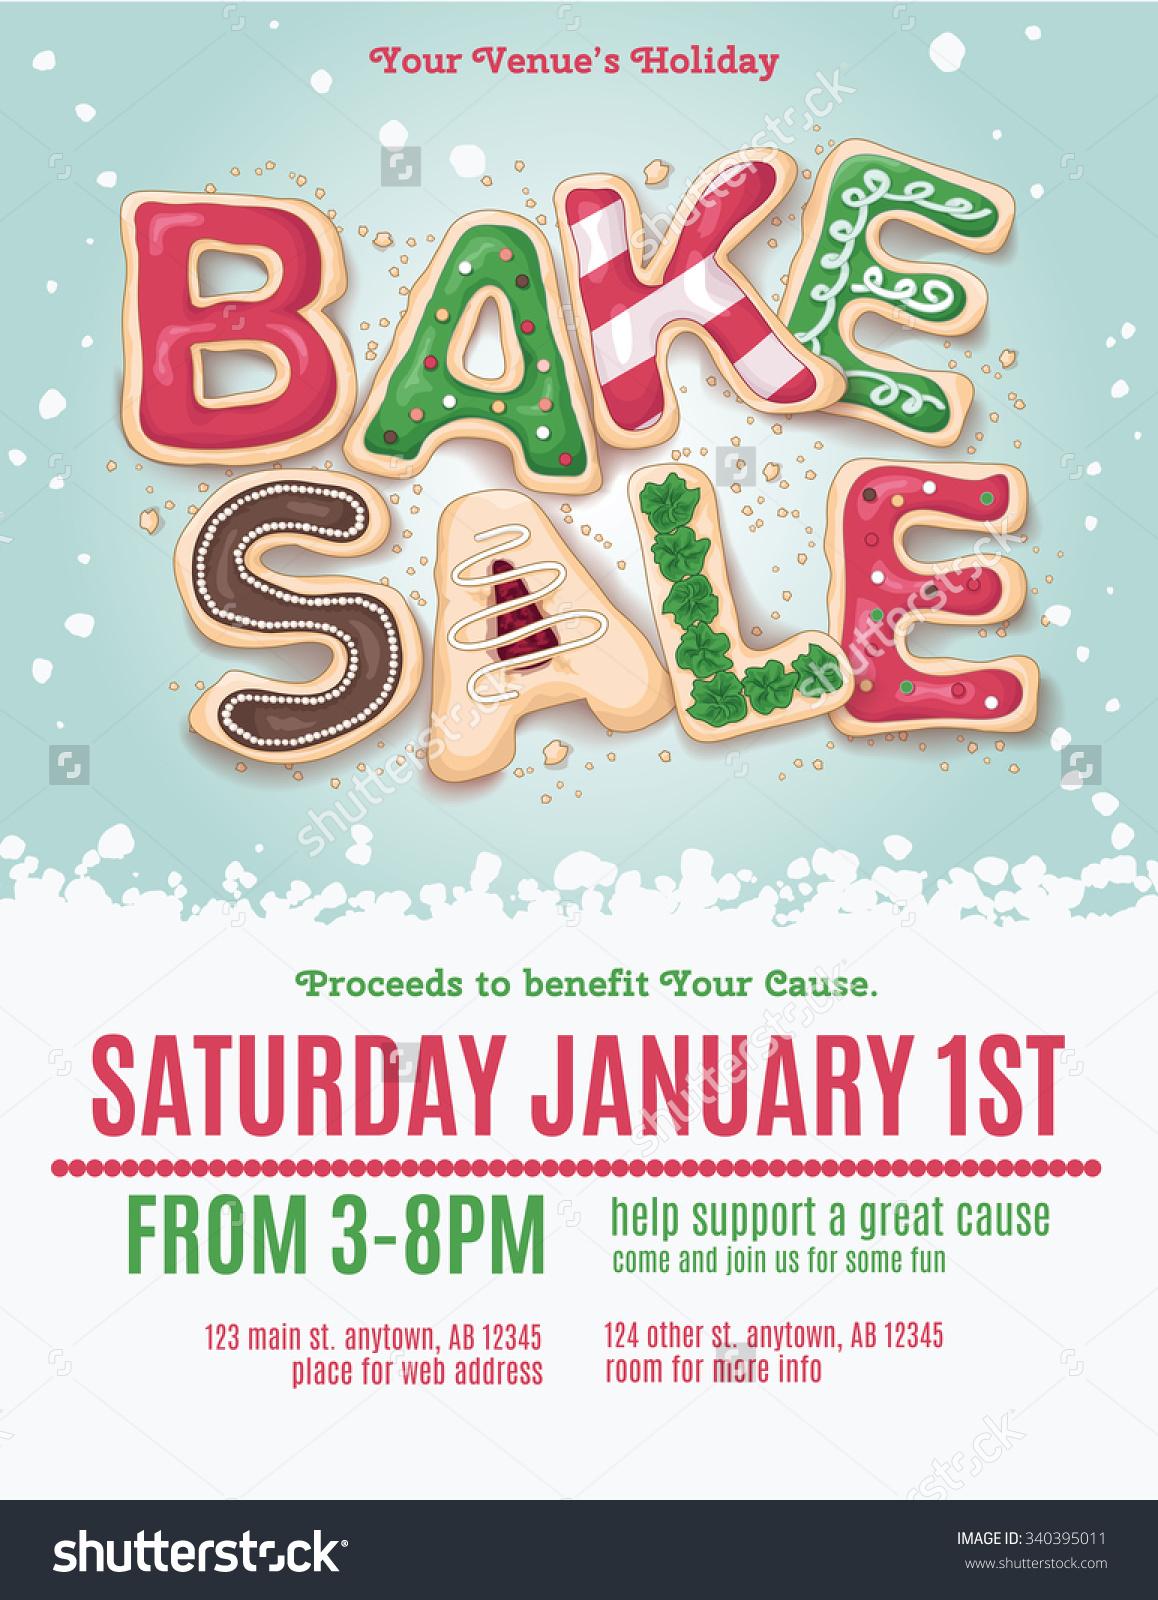 Holydays clipart bake sale Holiday bake sale clipart bake